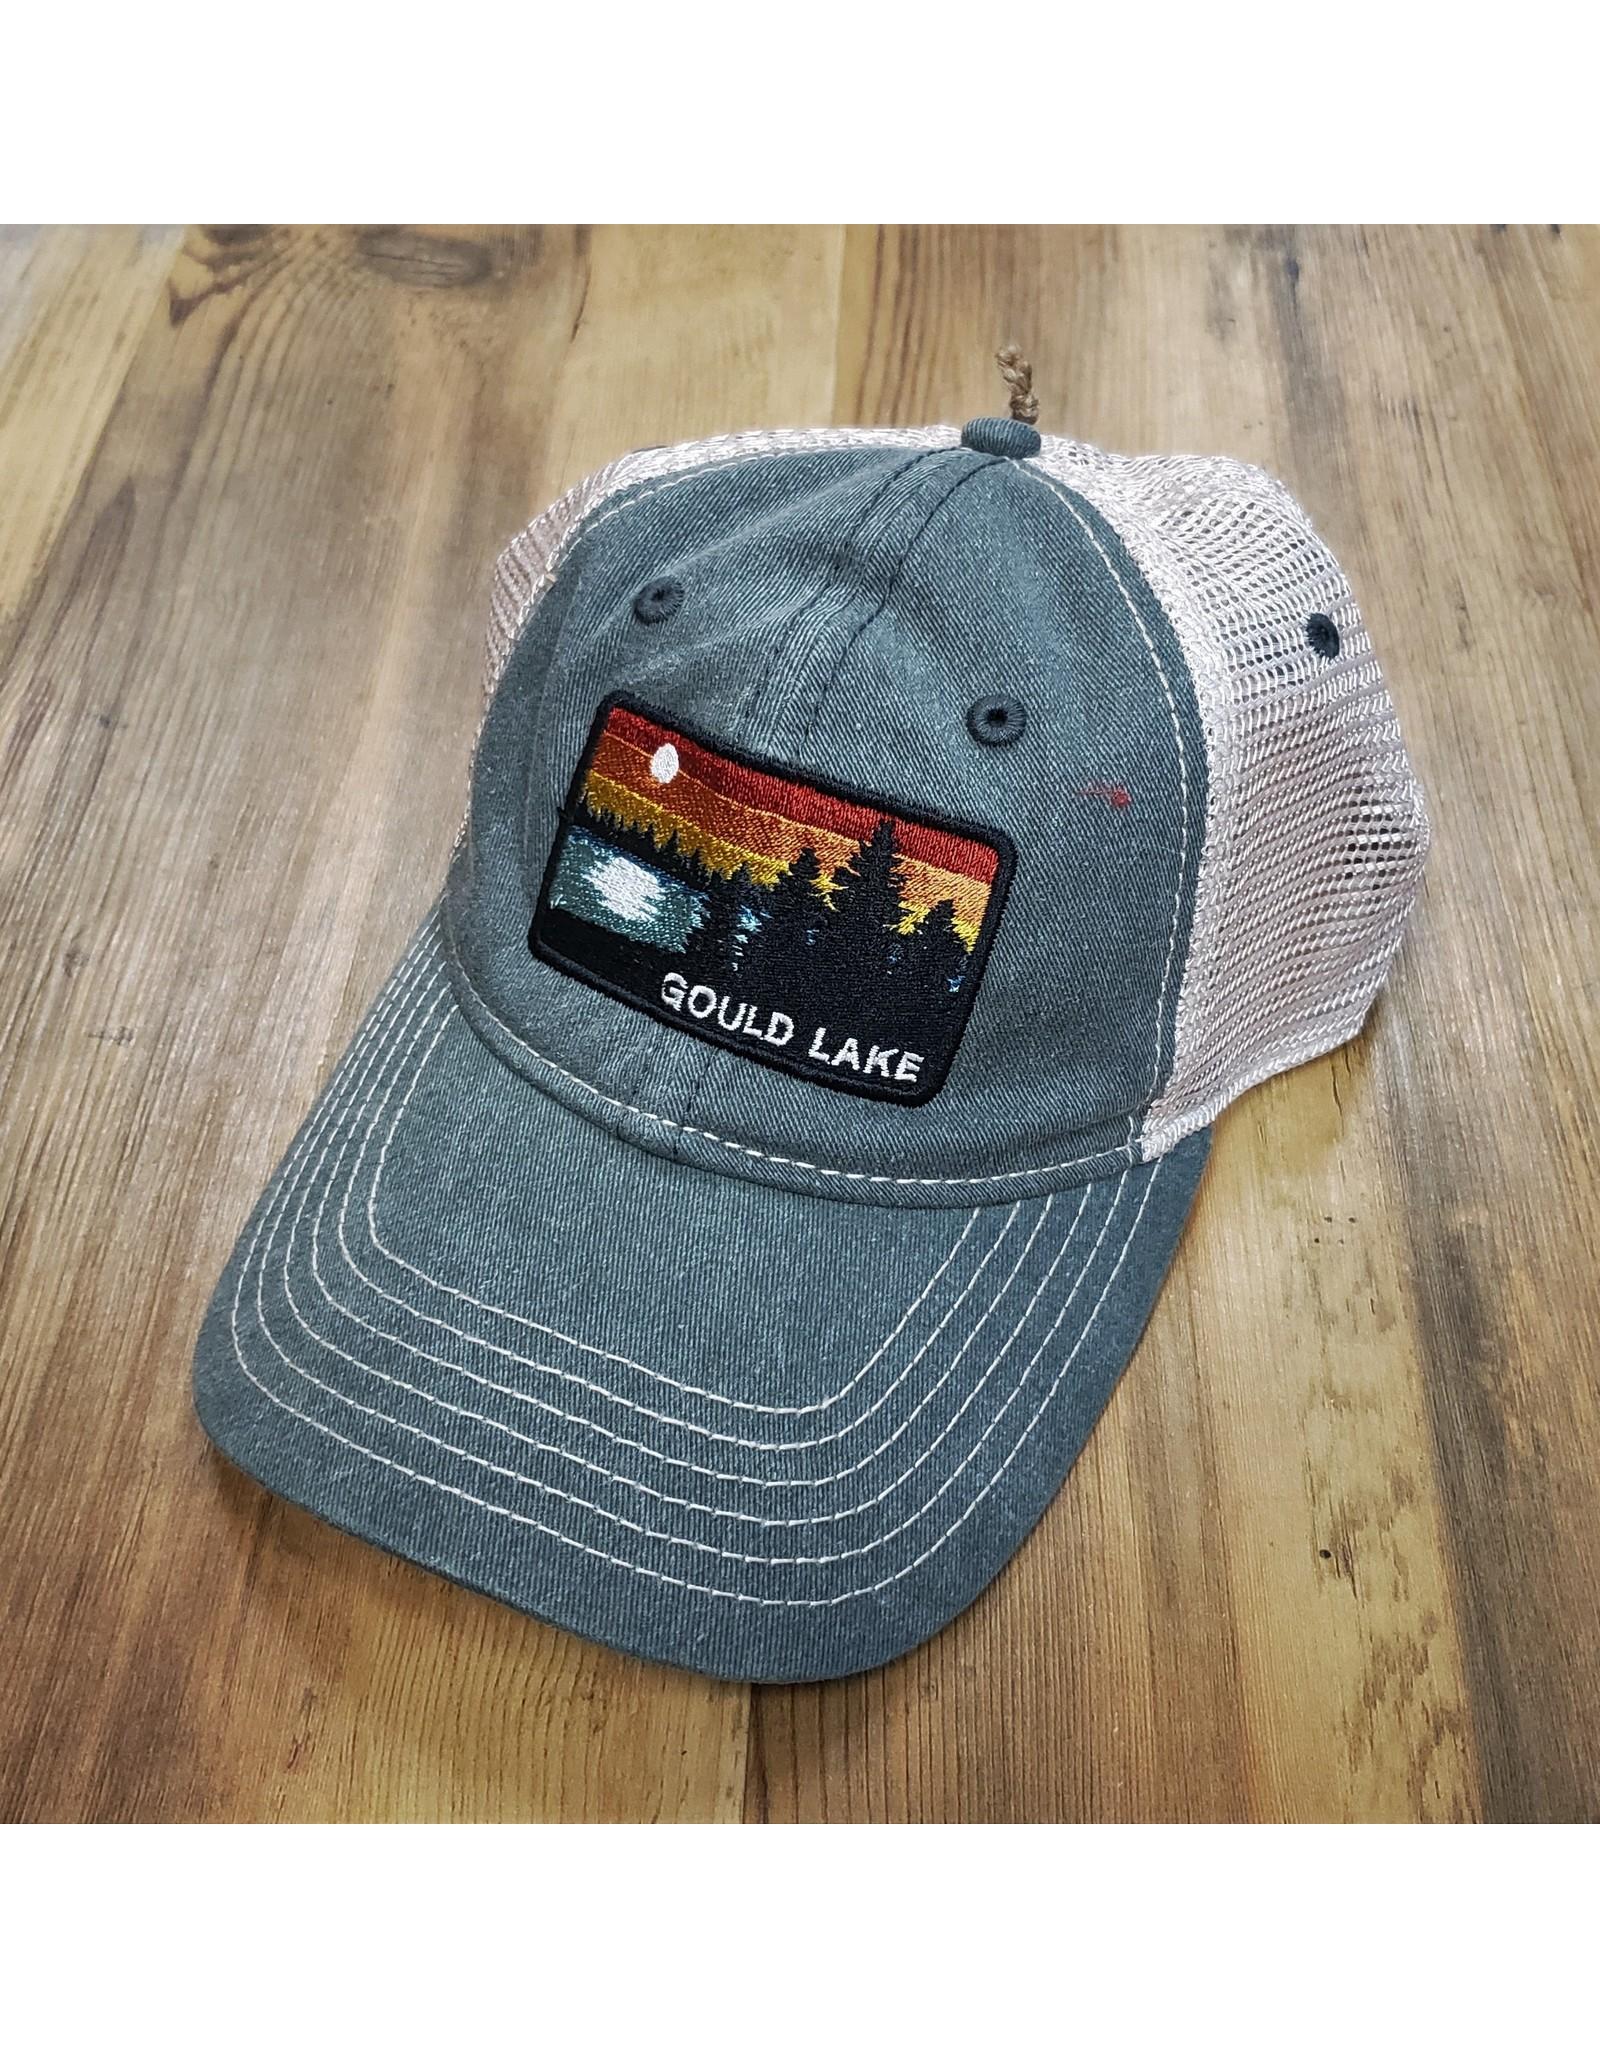 BLUE GOULD LAKE TRUCKER HAT